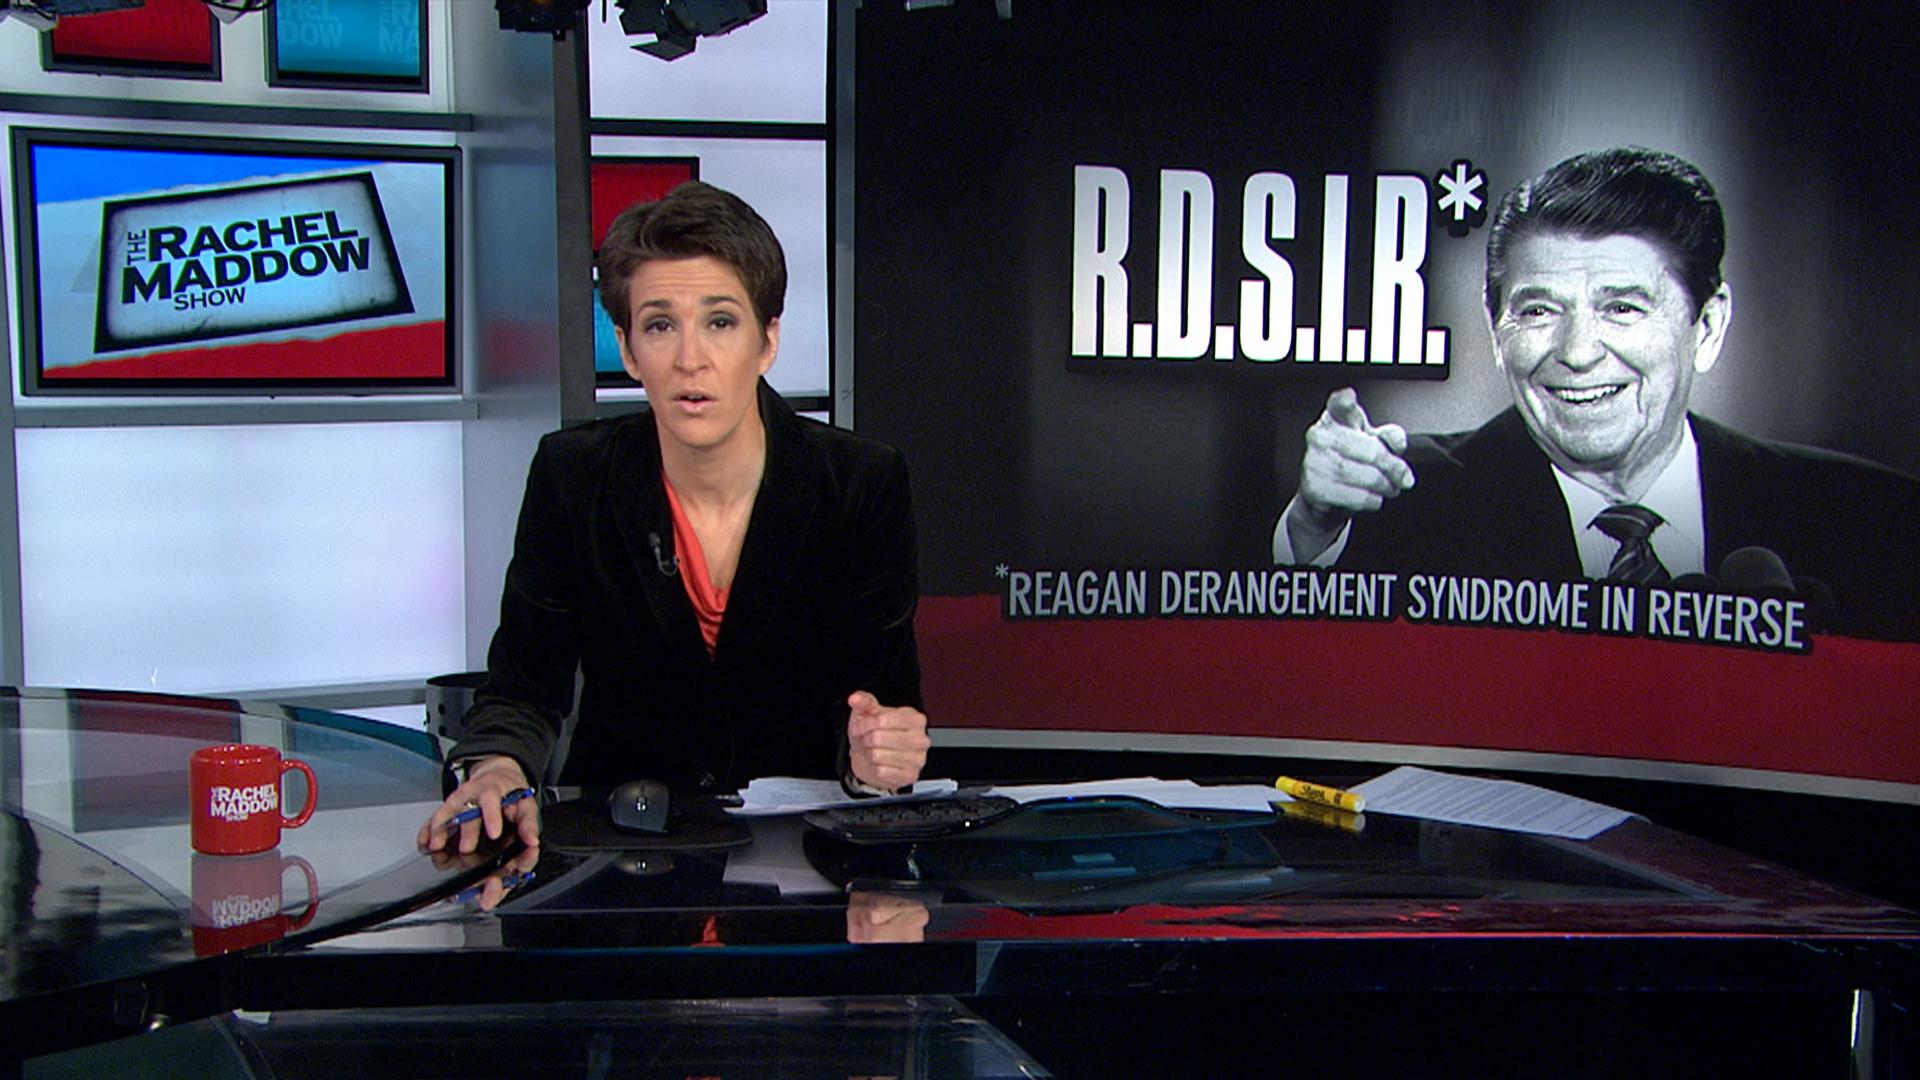 Paul caught knocking GOP's false saint Reagan